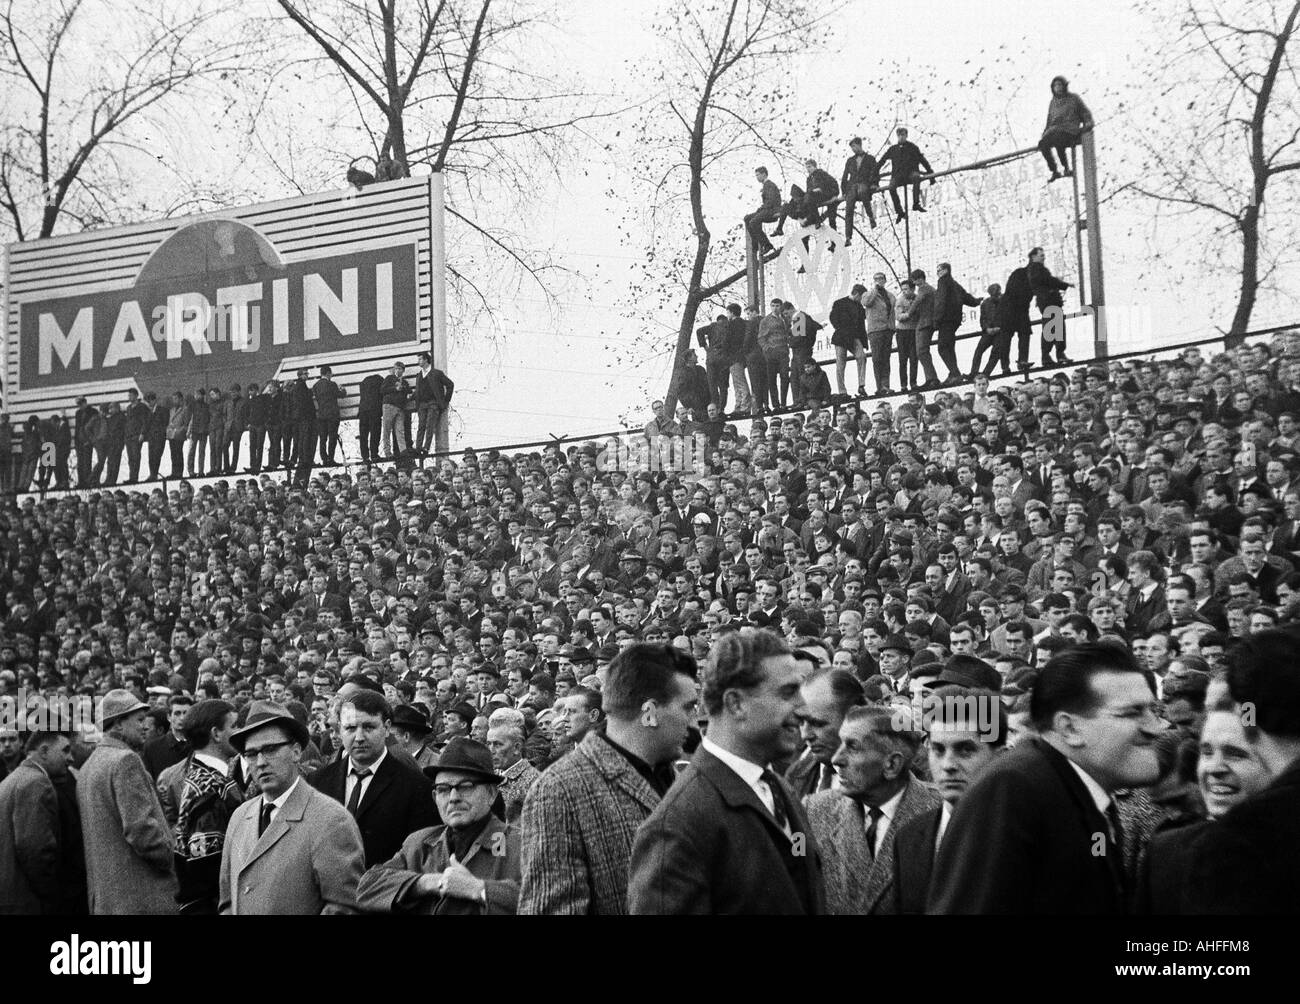 football, Bundesliga, 1965/1966, FC Schalke 04 versus FC Bayern Munich 1:1, Glueckaufkampfbahn Stadium in Gelsenkirchen, crowd of spectators, football fans on a advertising billboard - Stock Image